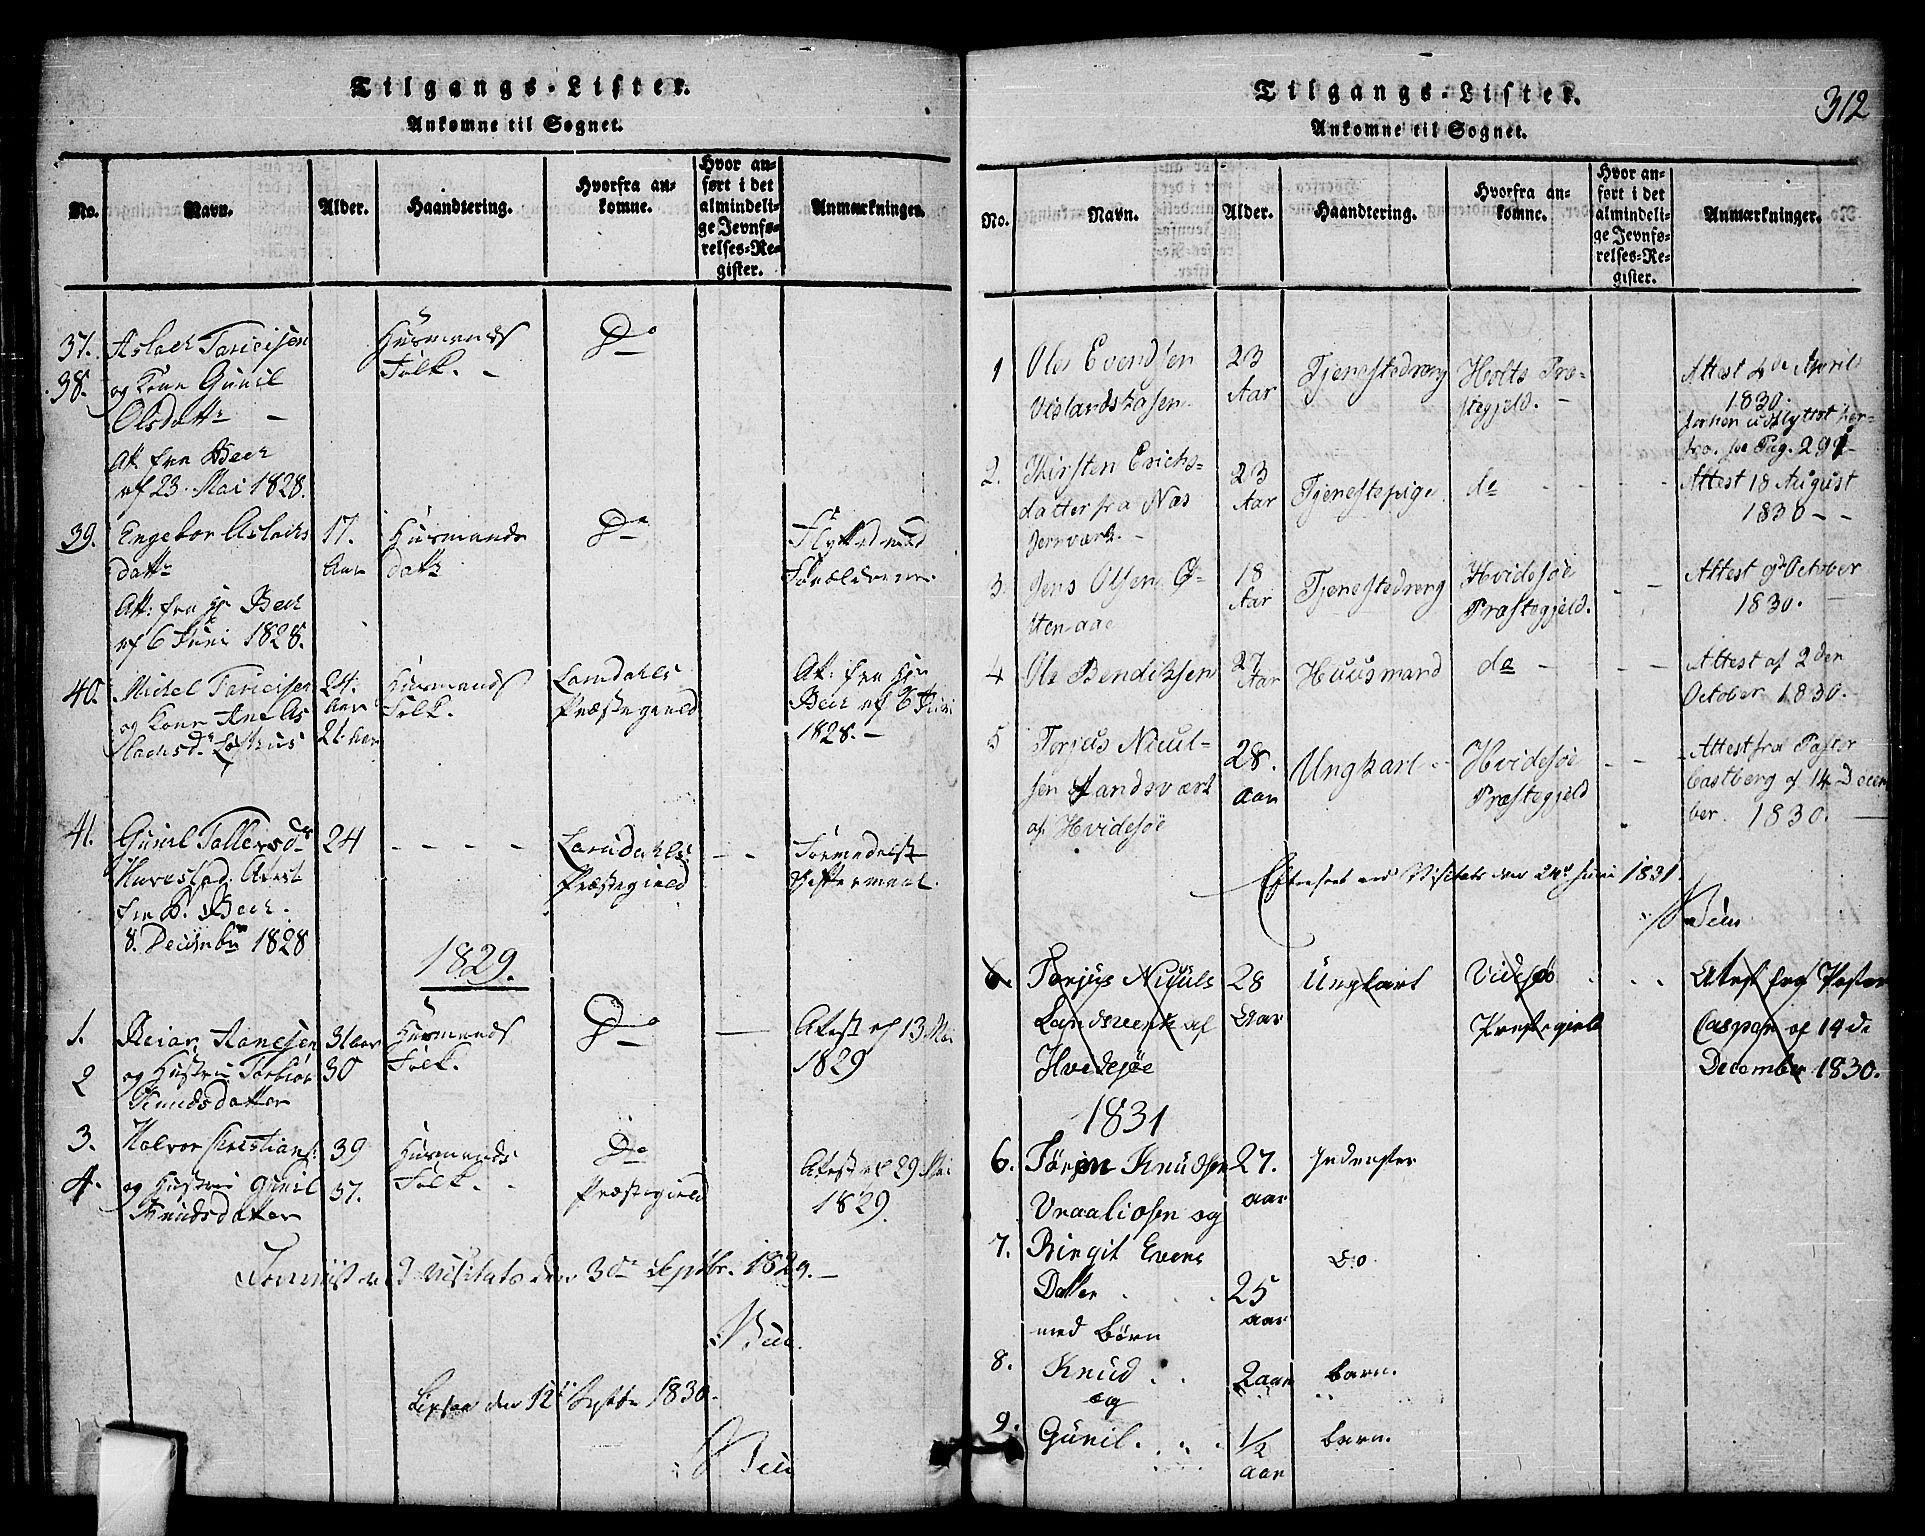 SAKO, Mo kirkebøker, G/Gb/L0001: Klokkerbok nr. II 1, 1814-1843, s. 312